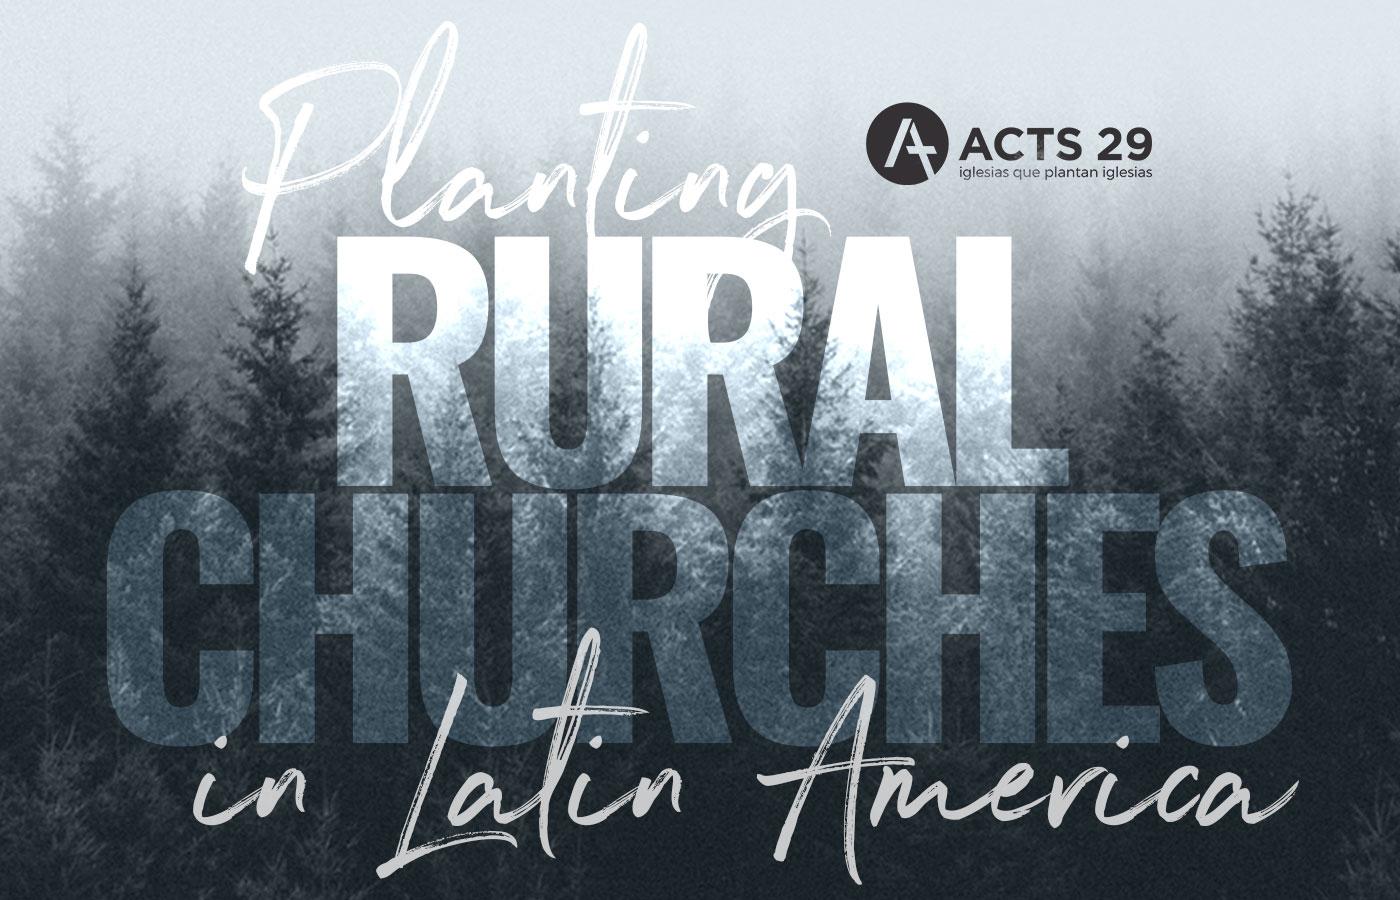 Planting Rural Churches in Latin America